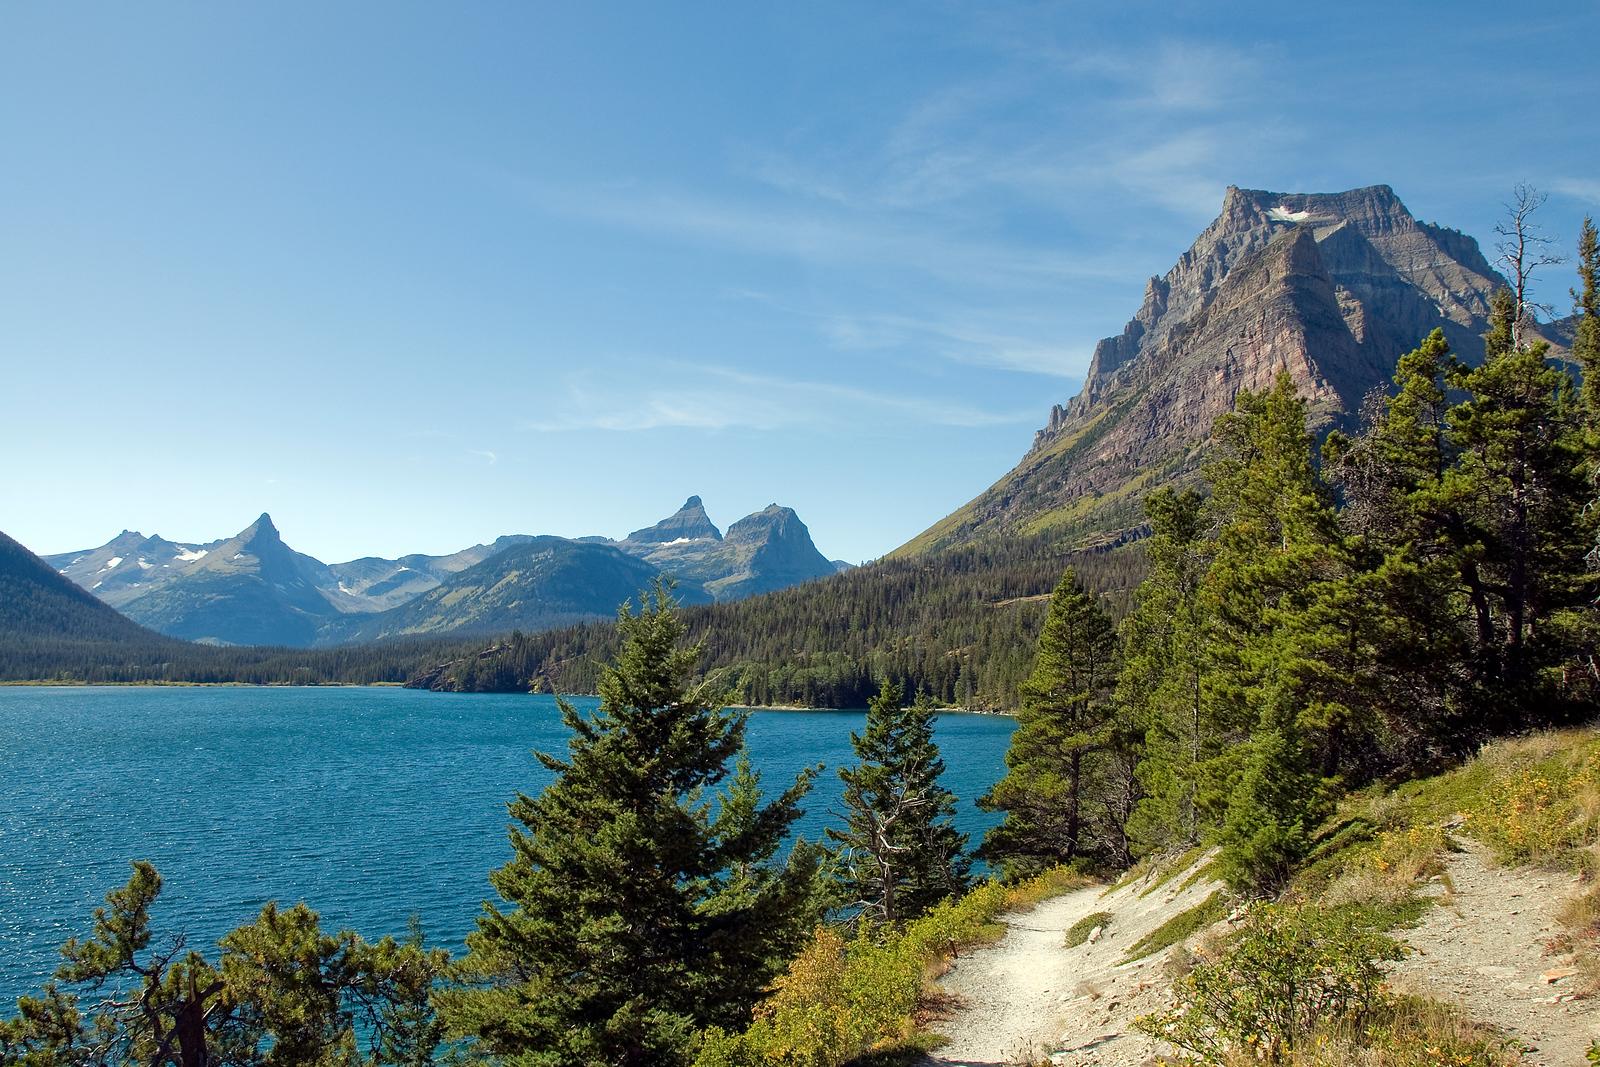 Waterton-Glacier International Peace Park World Heritage Site